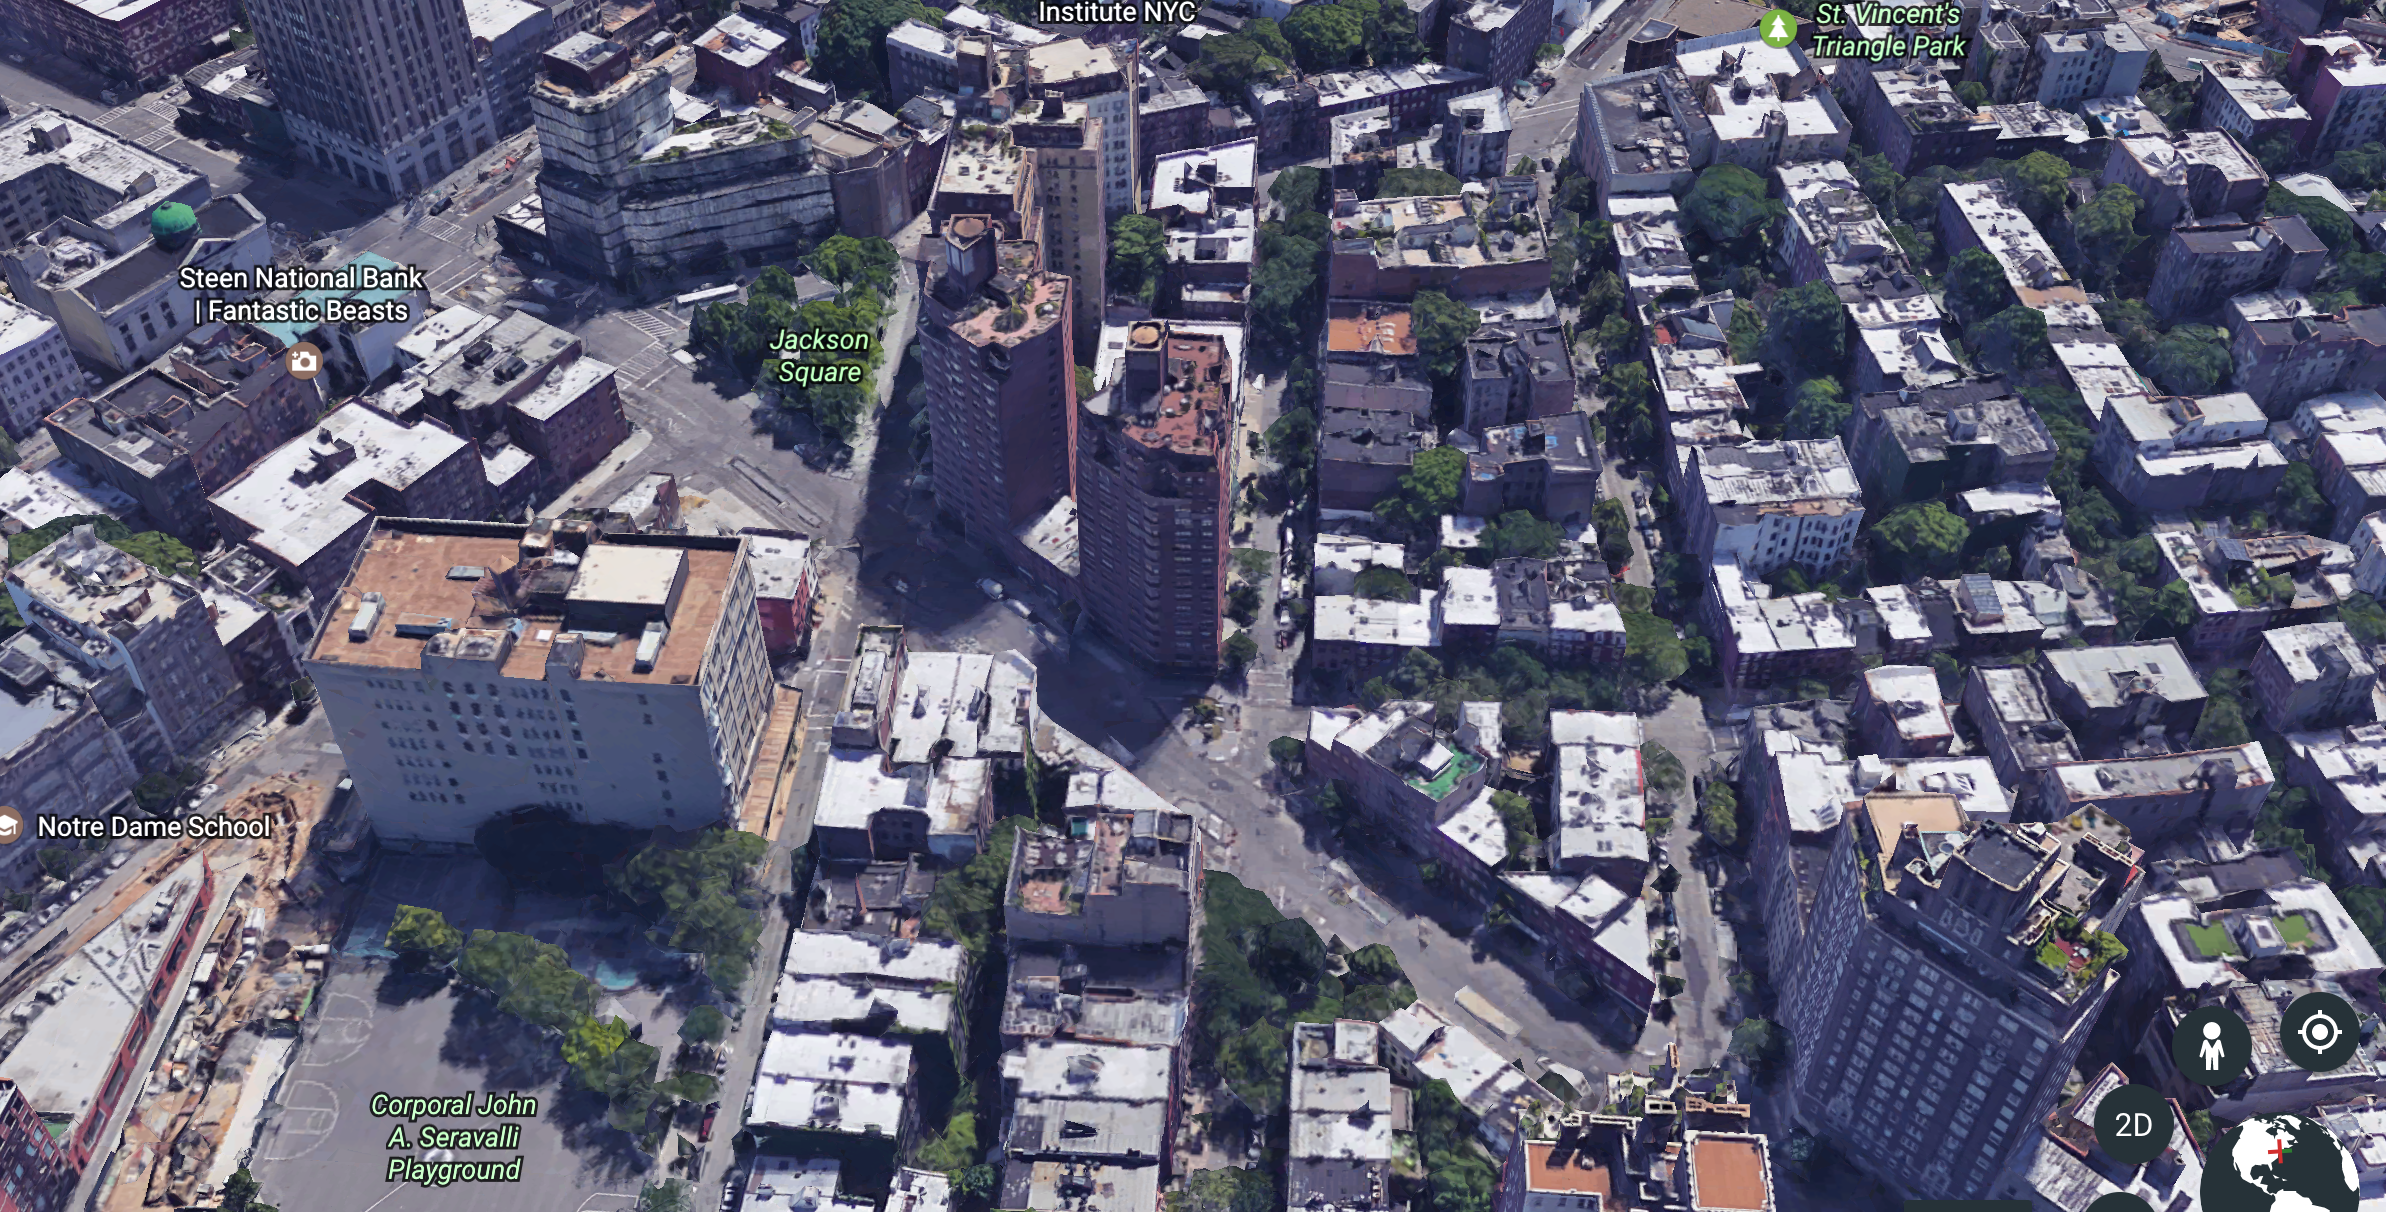 Jane Street,New York City